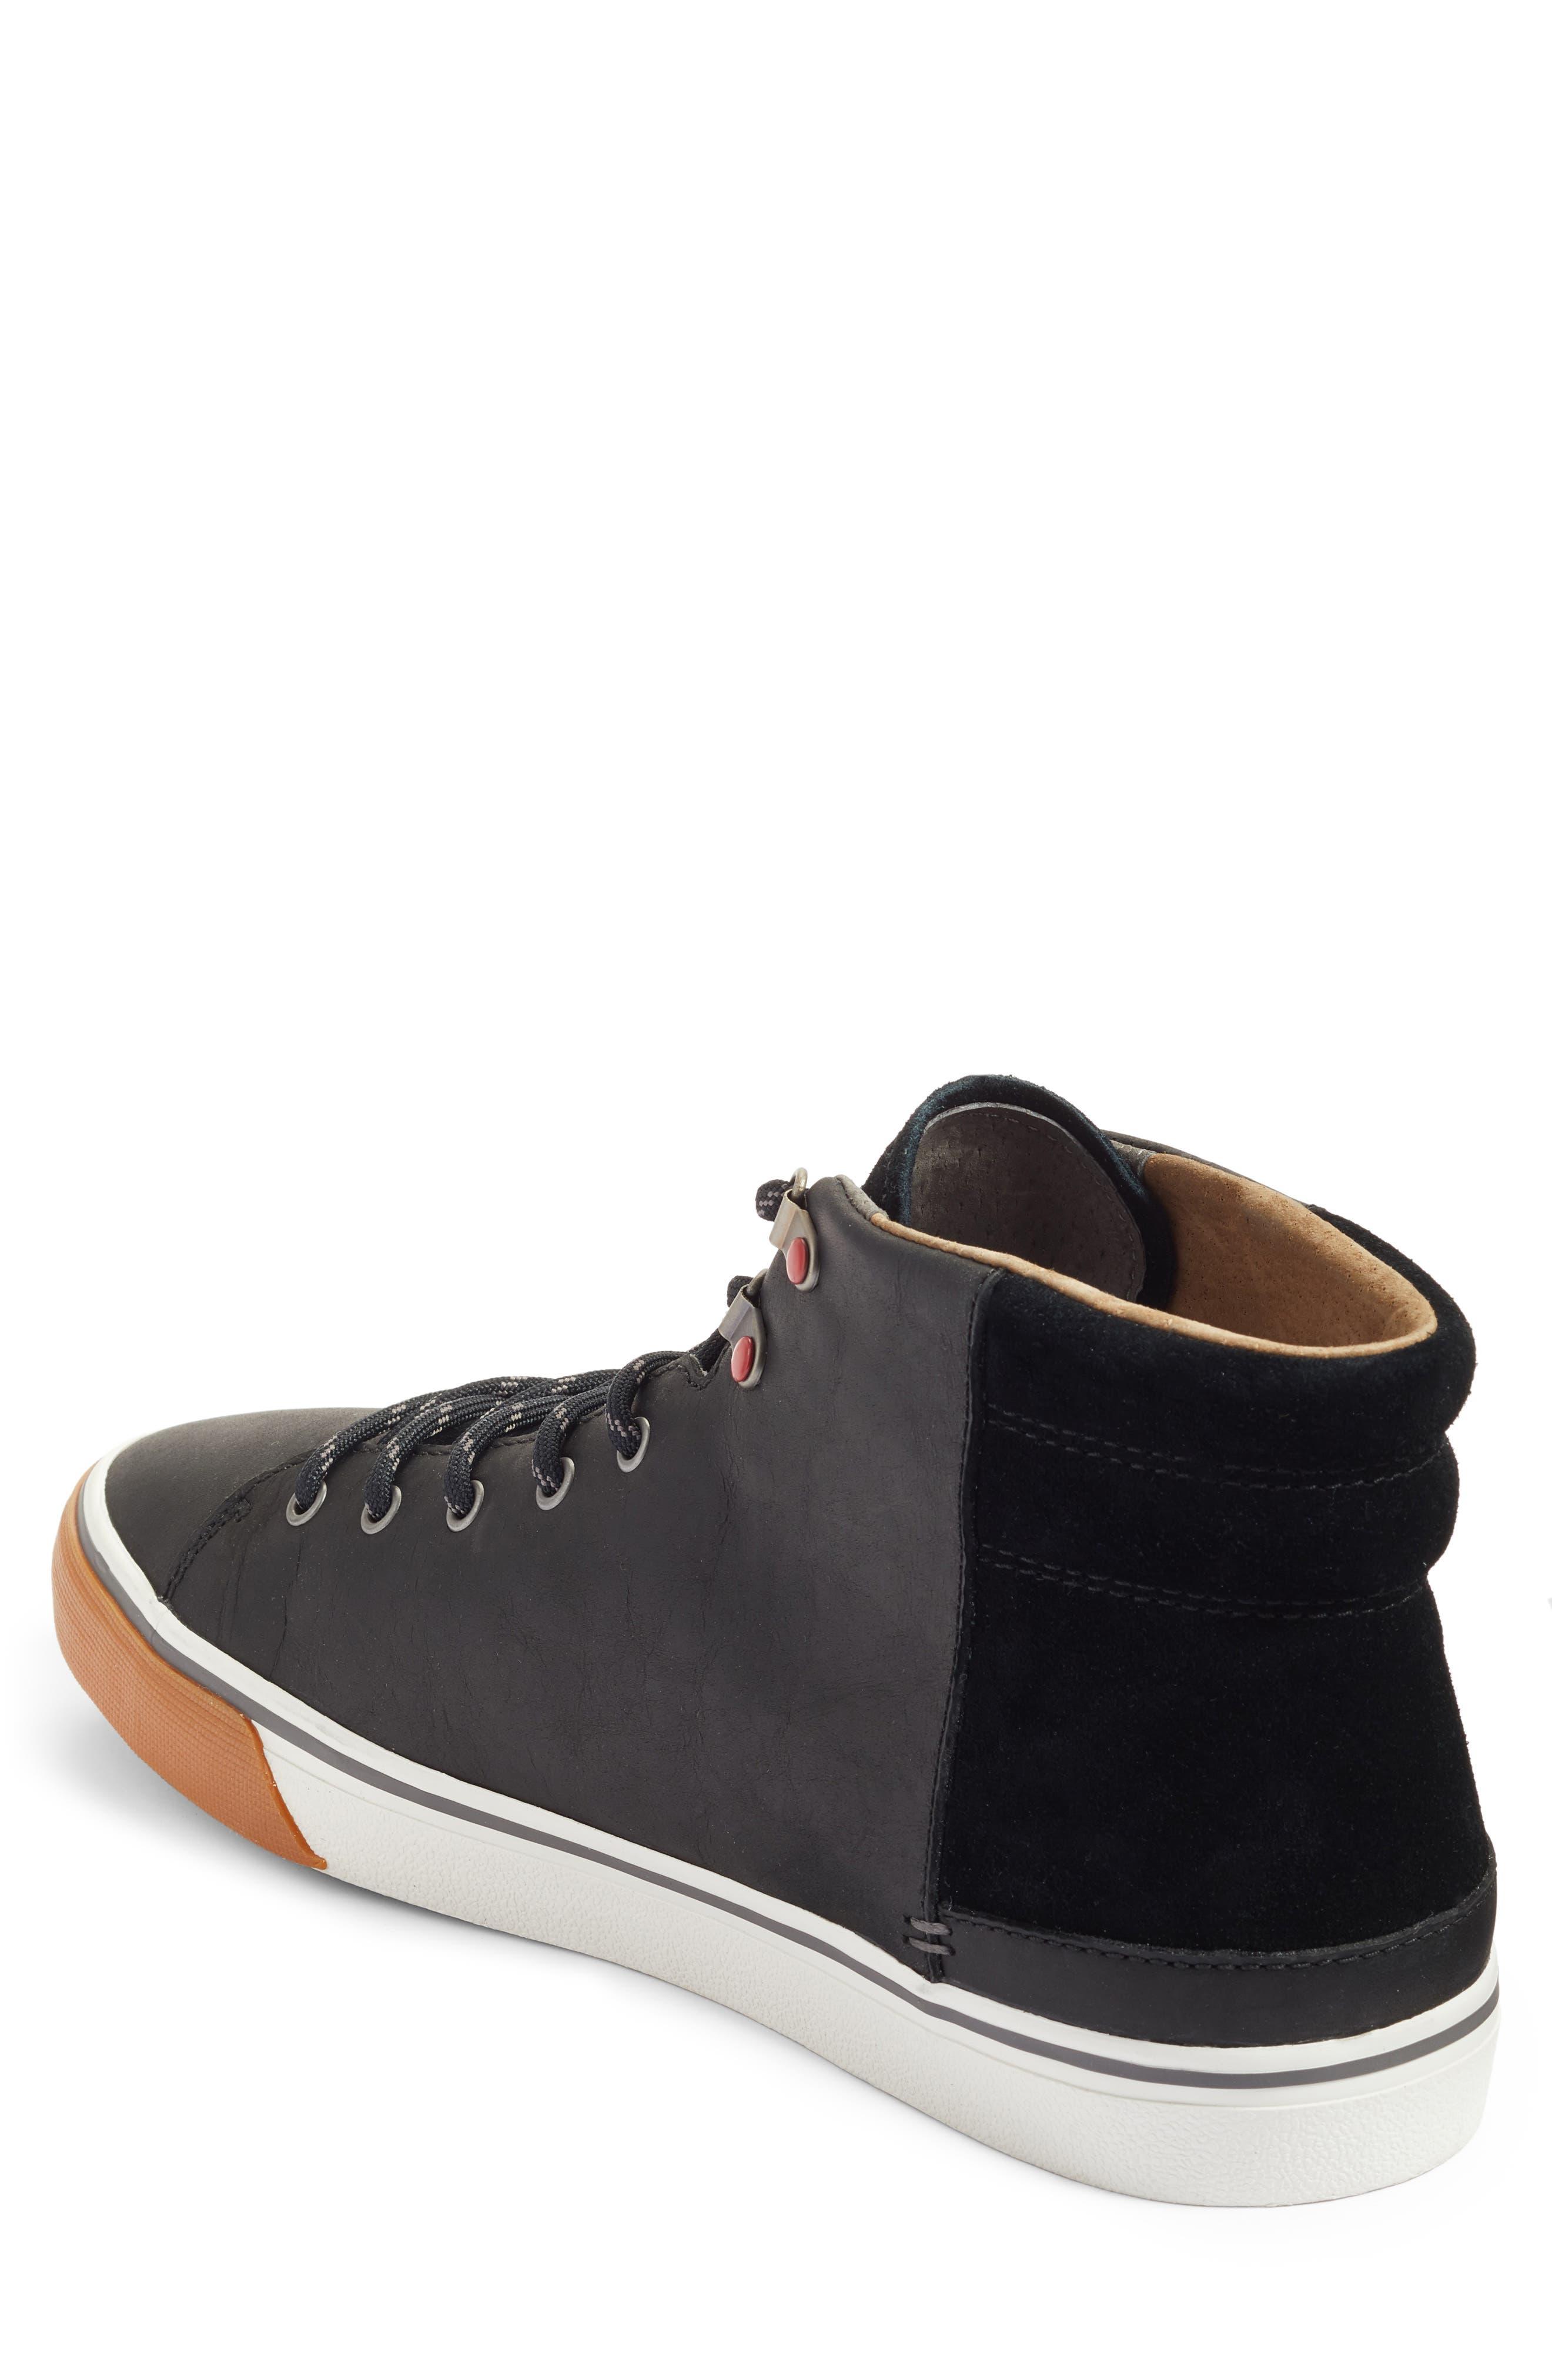 Hoyt High Top Sneaker,                             Alternate thumbnail 2, color,                             001